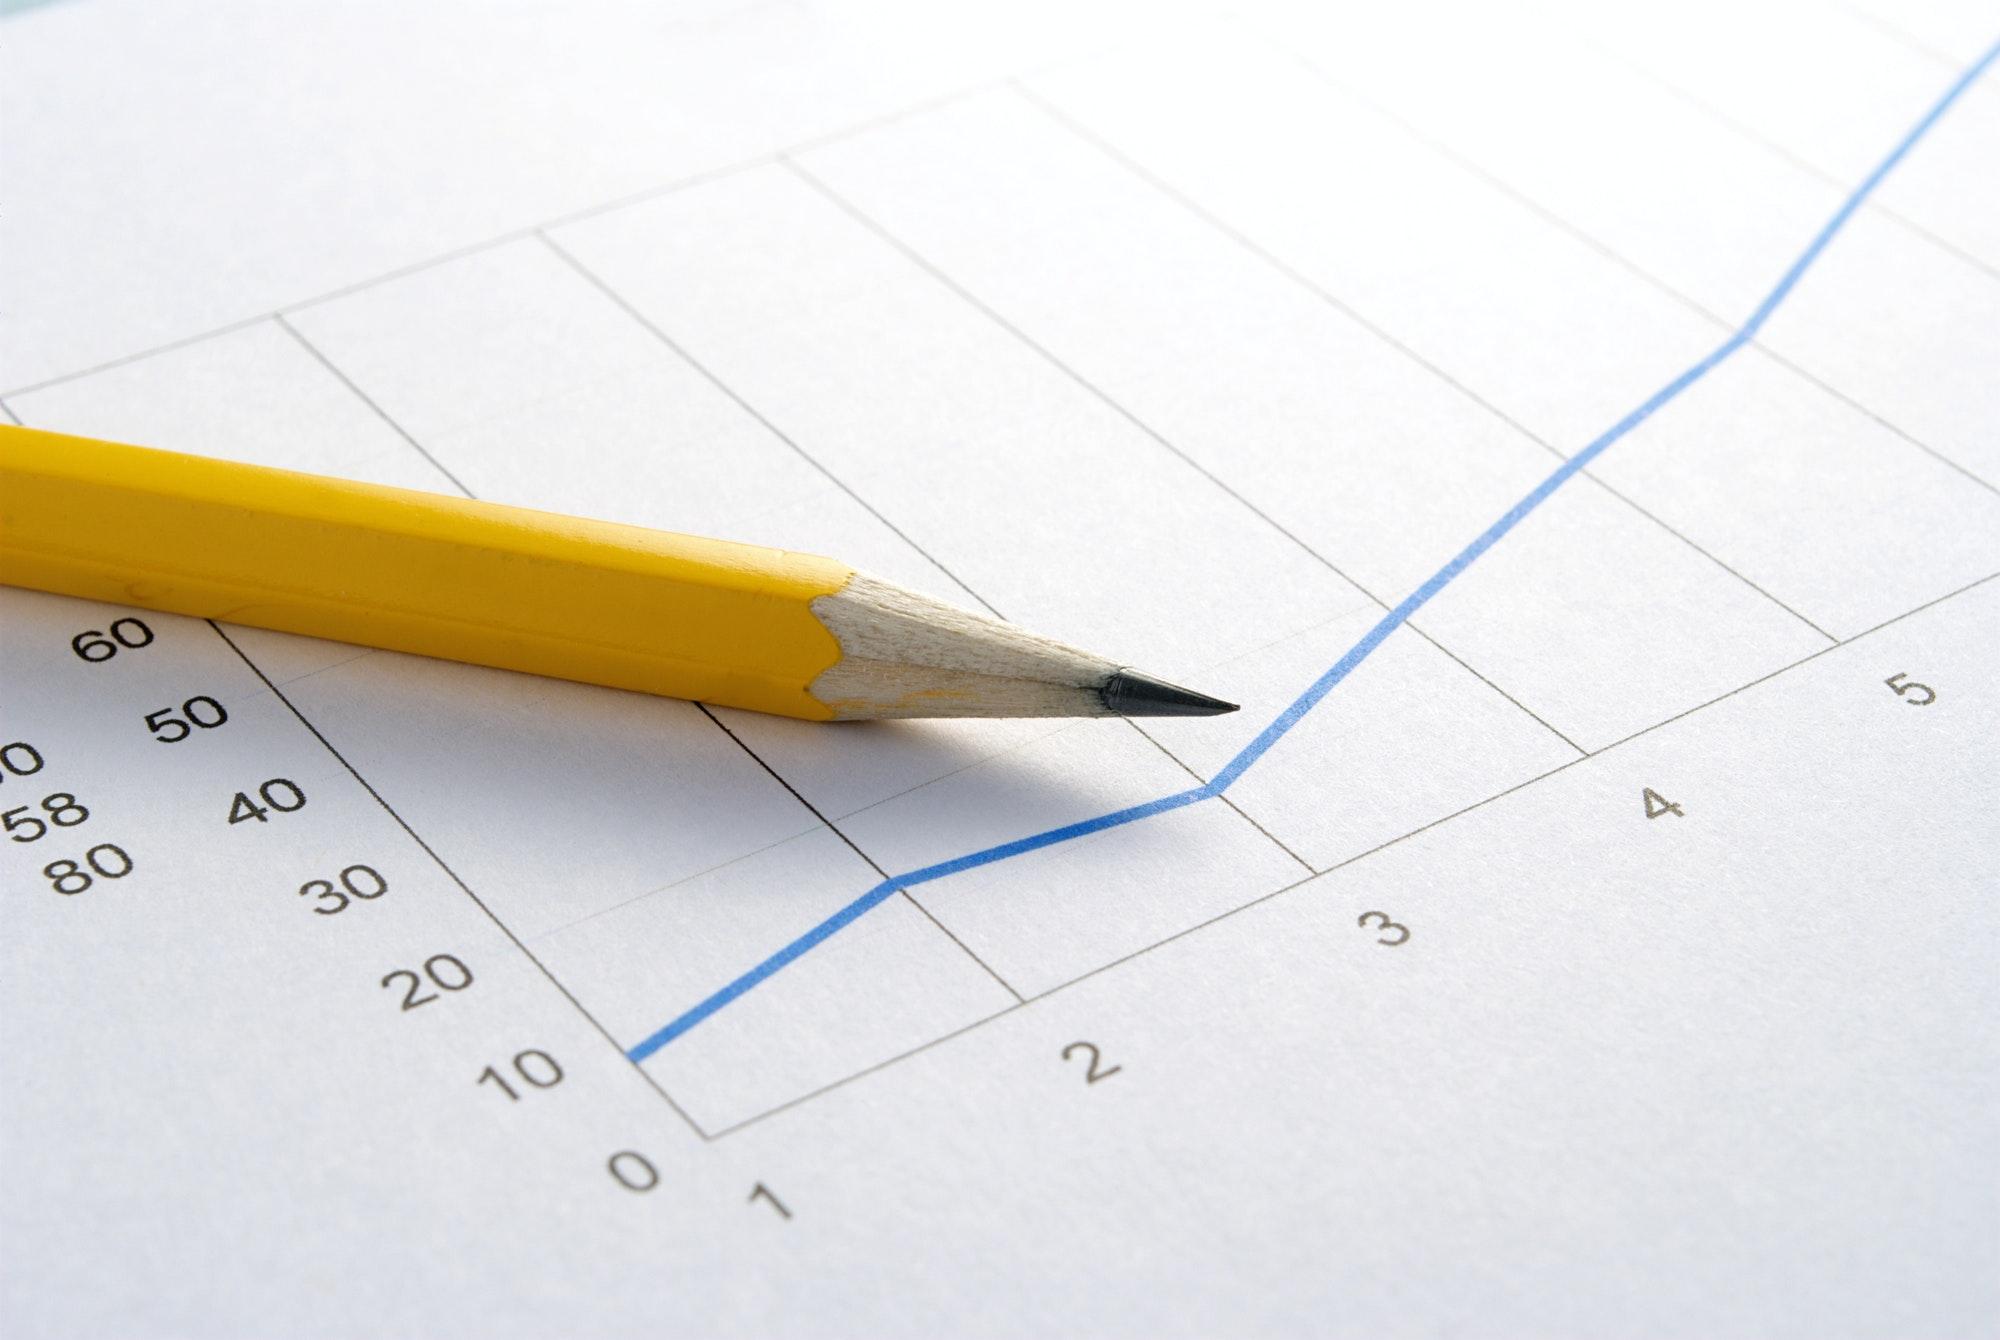 CREPP - South Atlanta Commercial Real Estate Site Selection Brokerage - Services - Property Management - 2